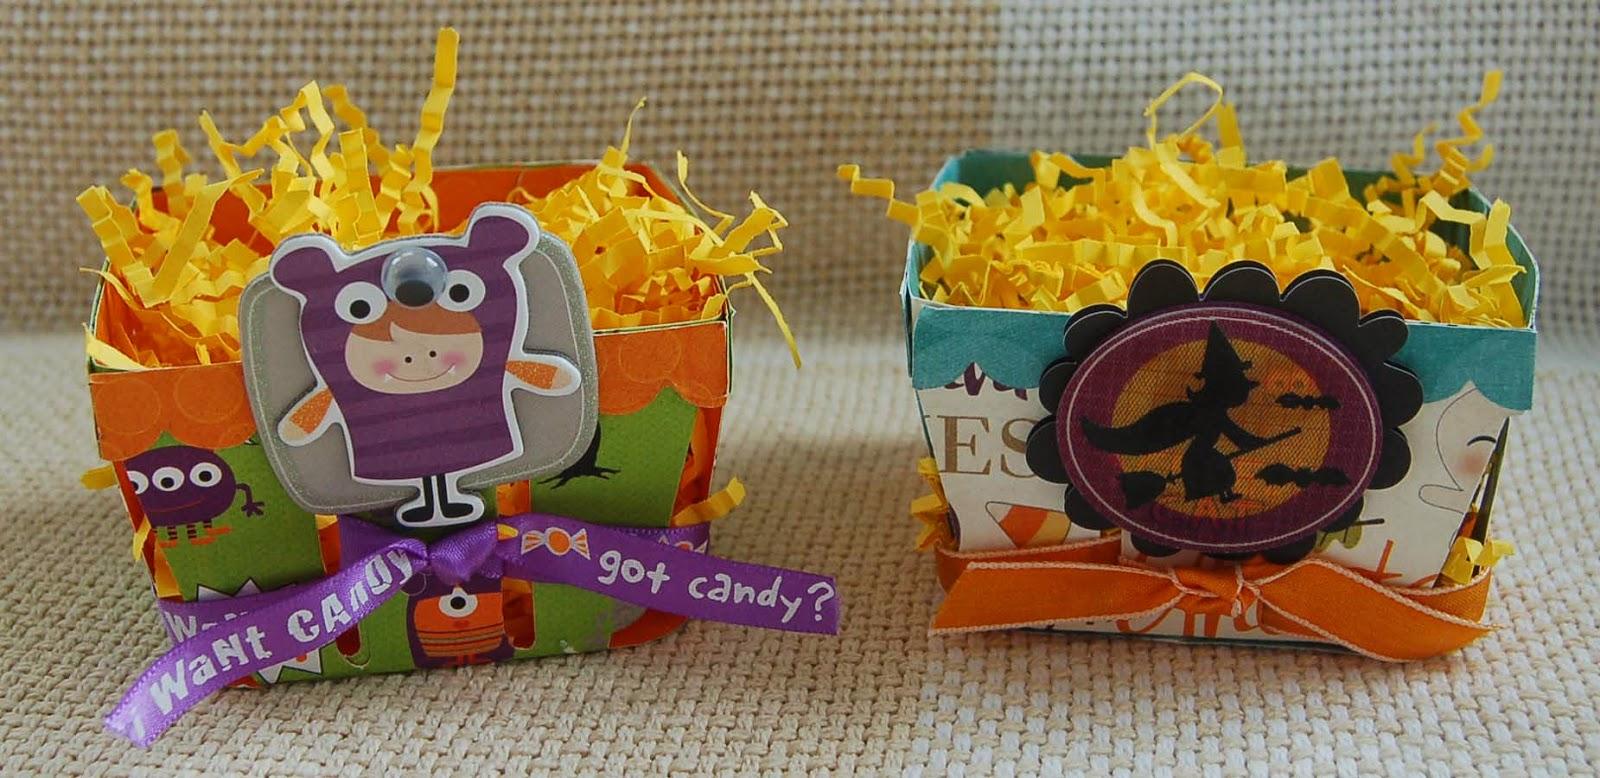 Lynn's Craft Blog: Halloween Treat Baskets